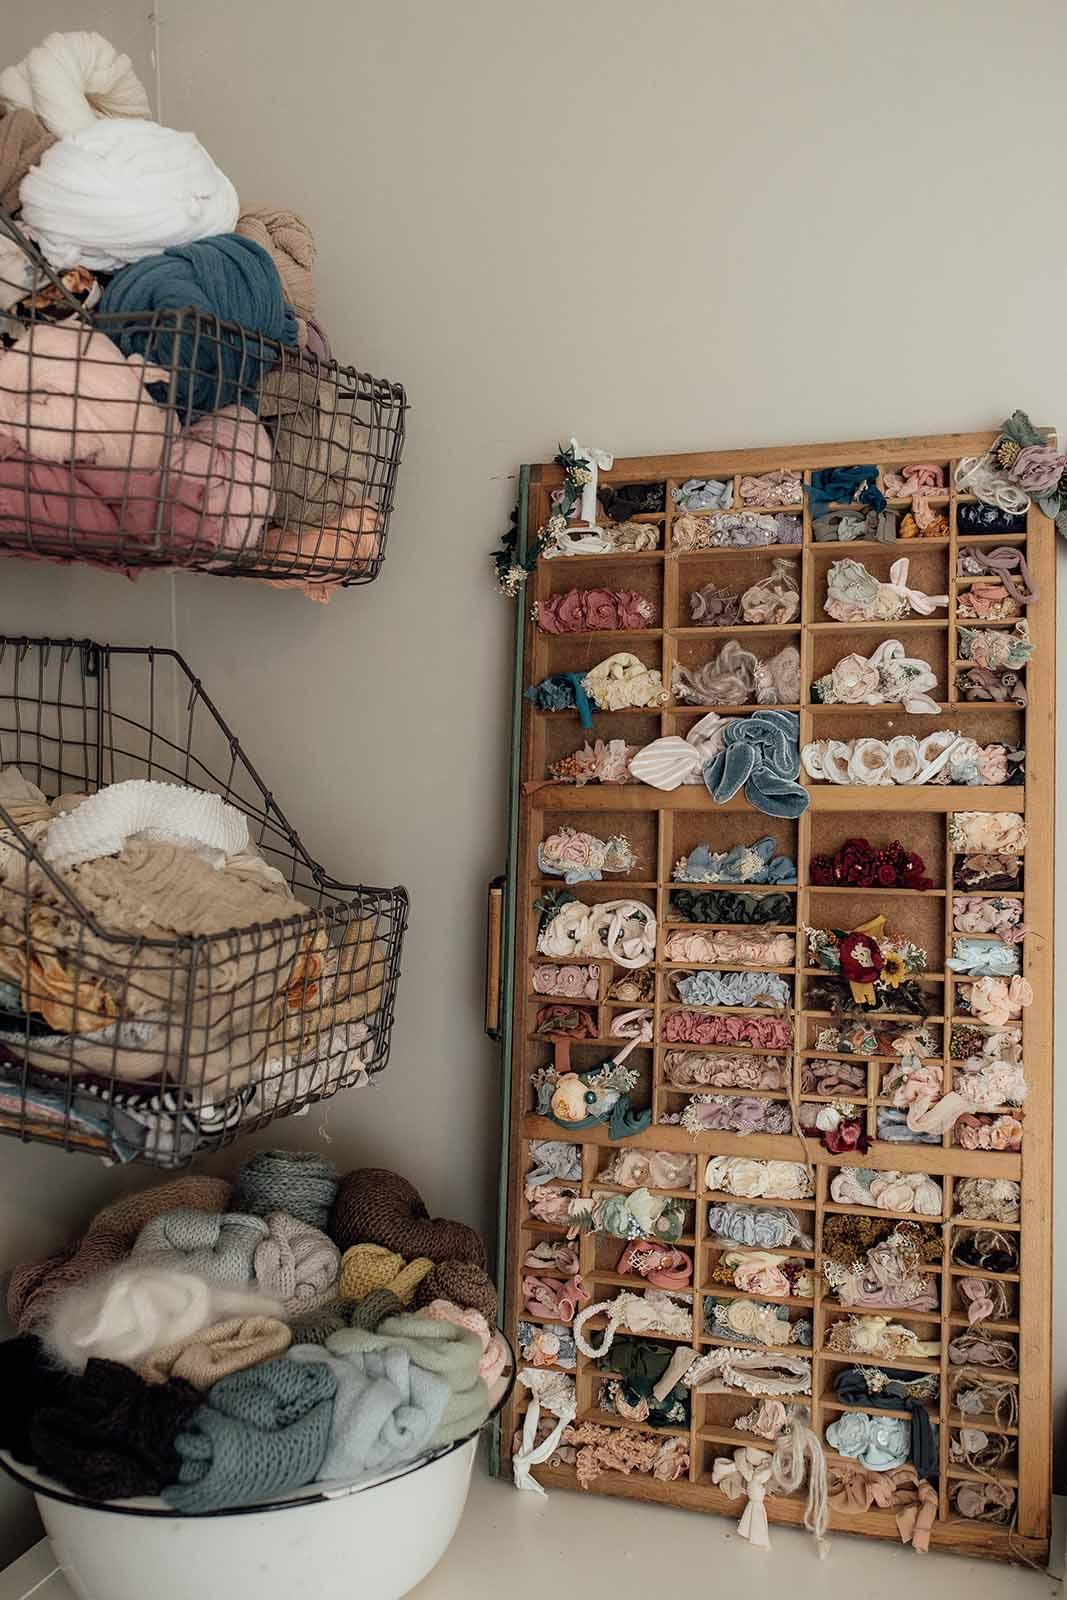 Newborn photography studio essentials - hats